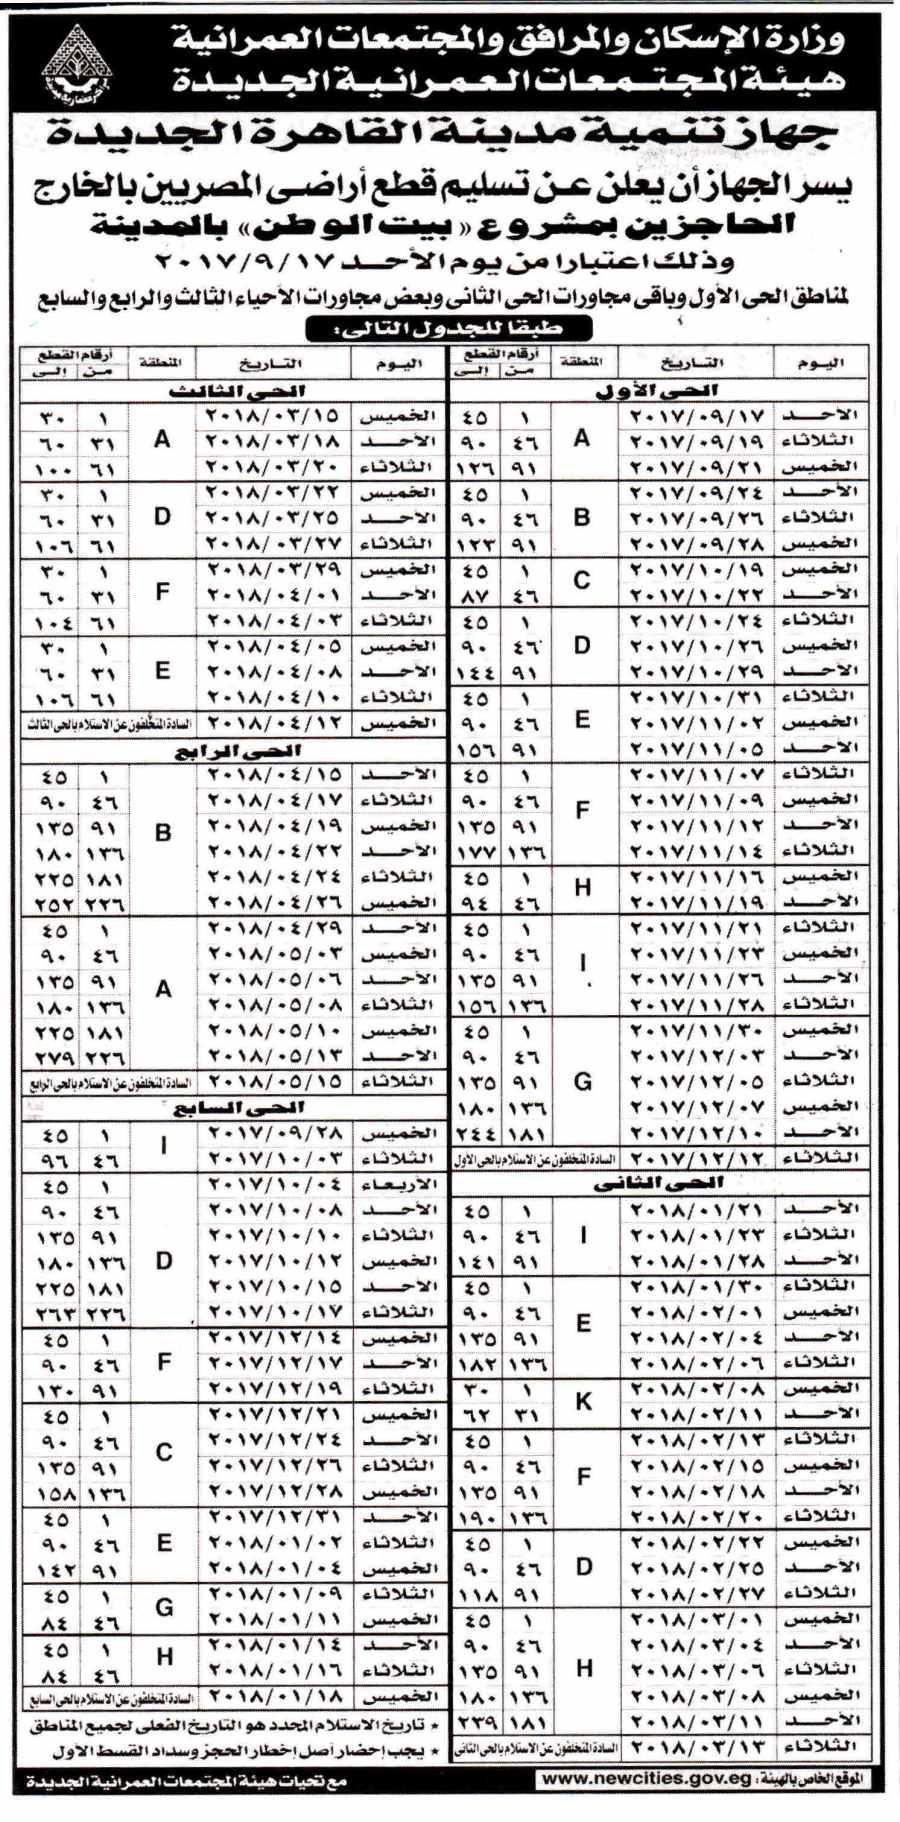 Al Ahram 28 Aug P.3.jpg